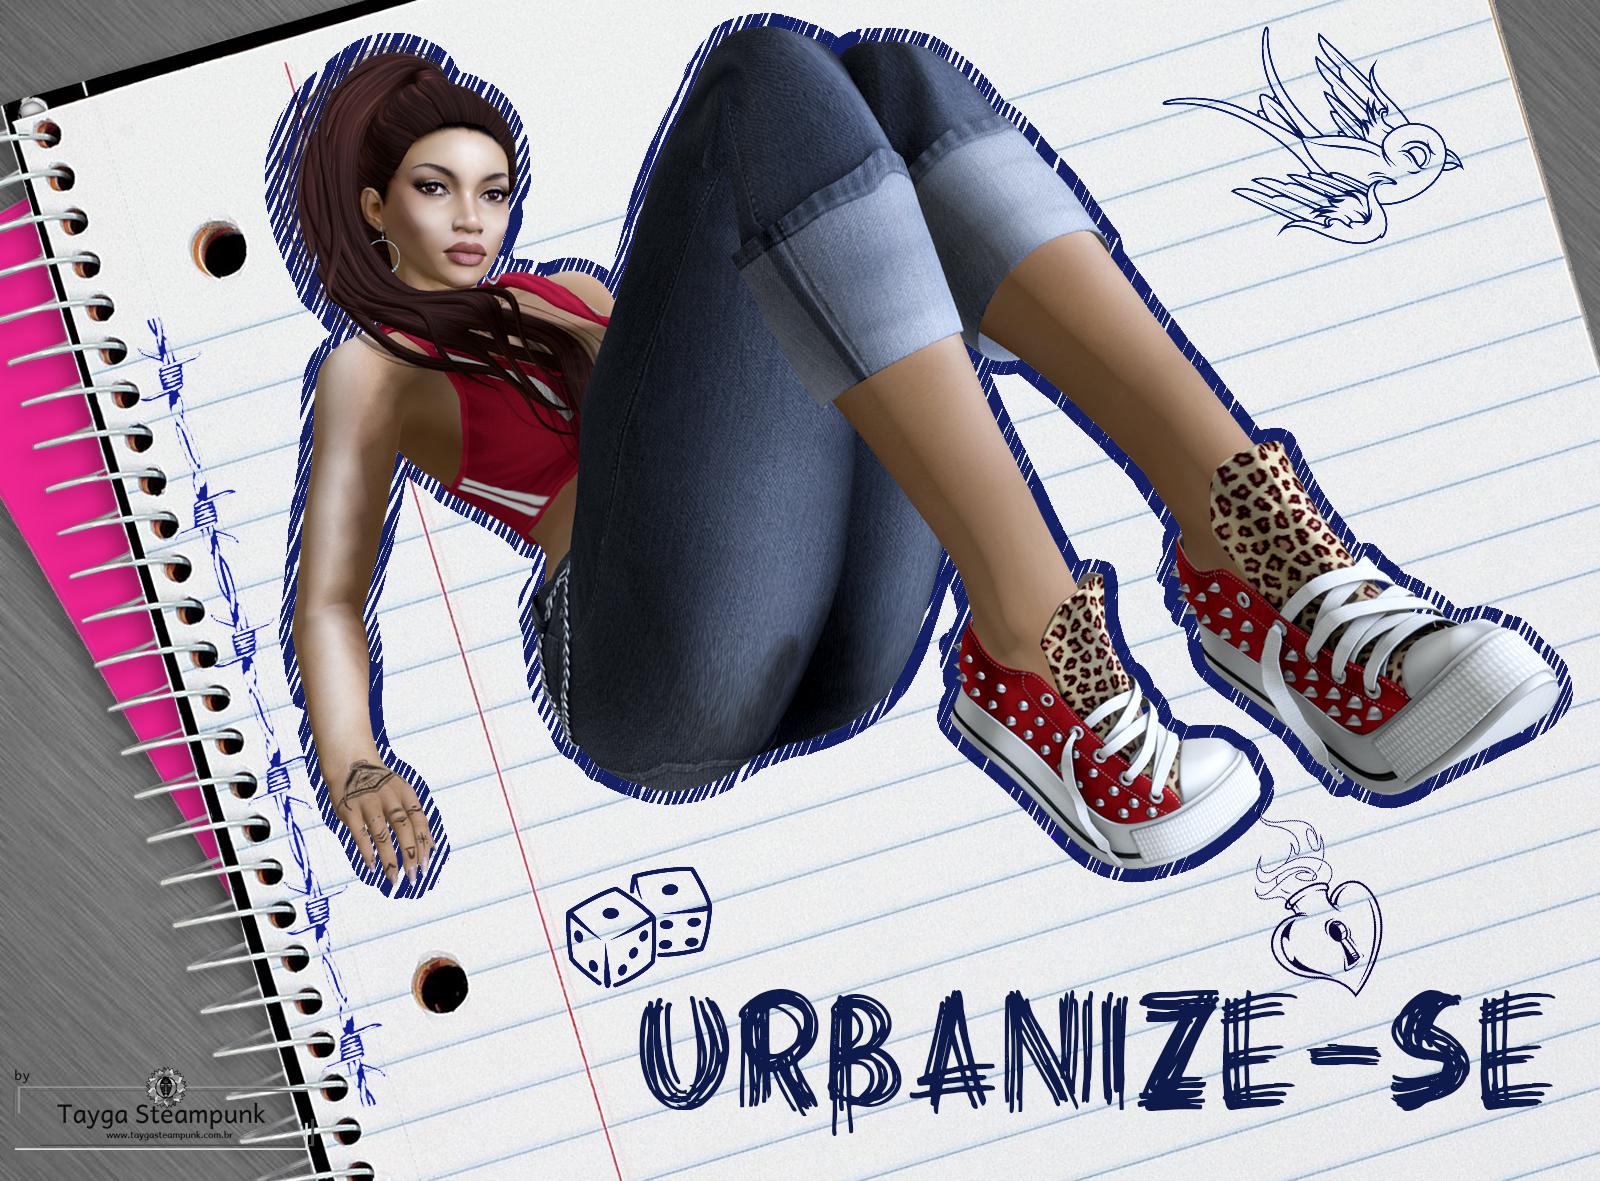 Urbanize-se... #98